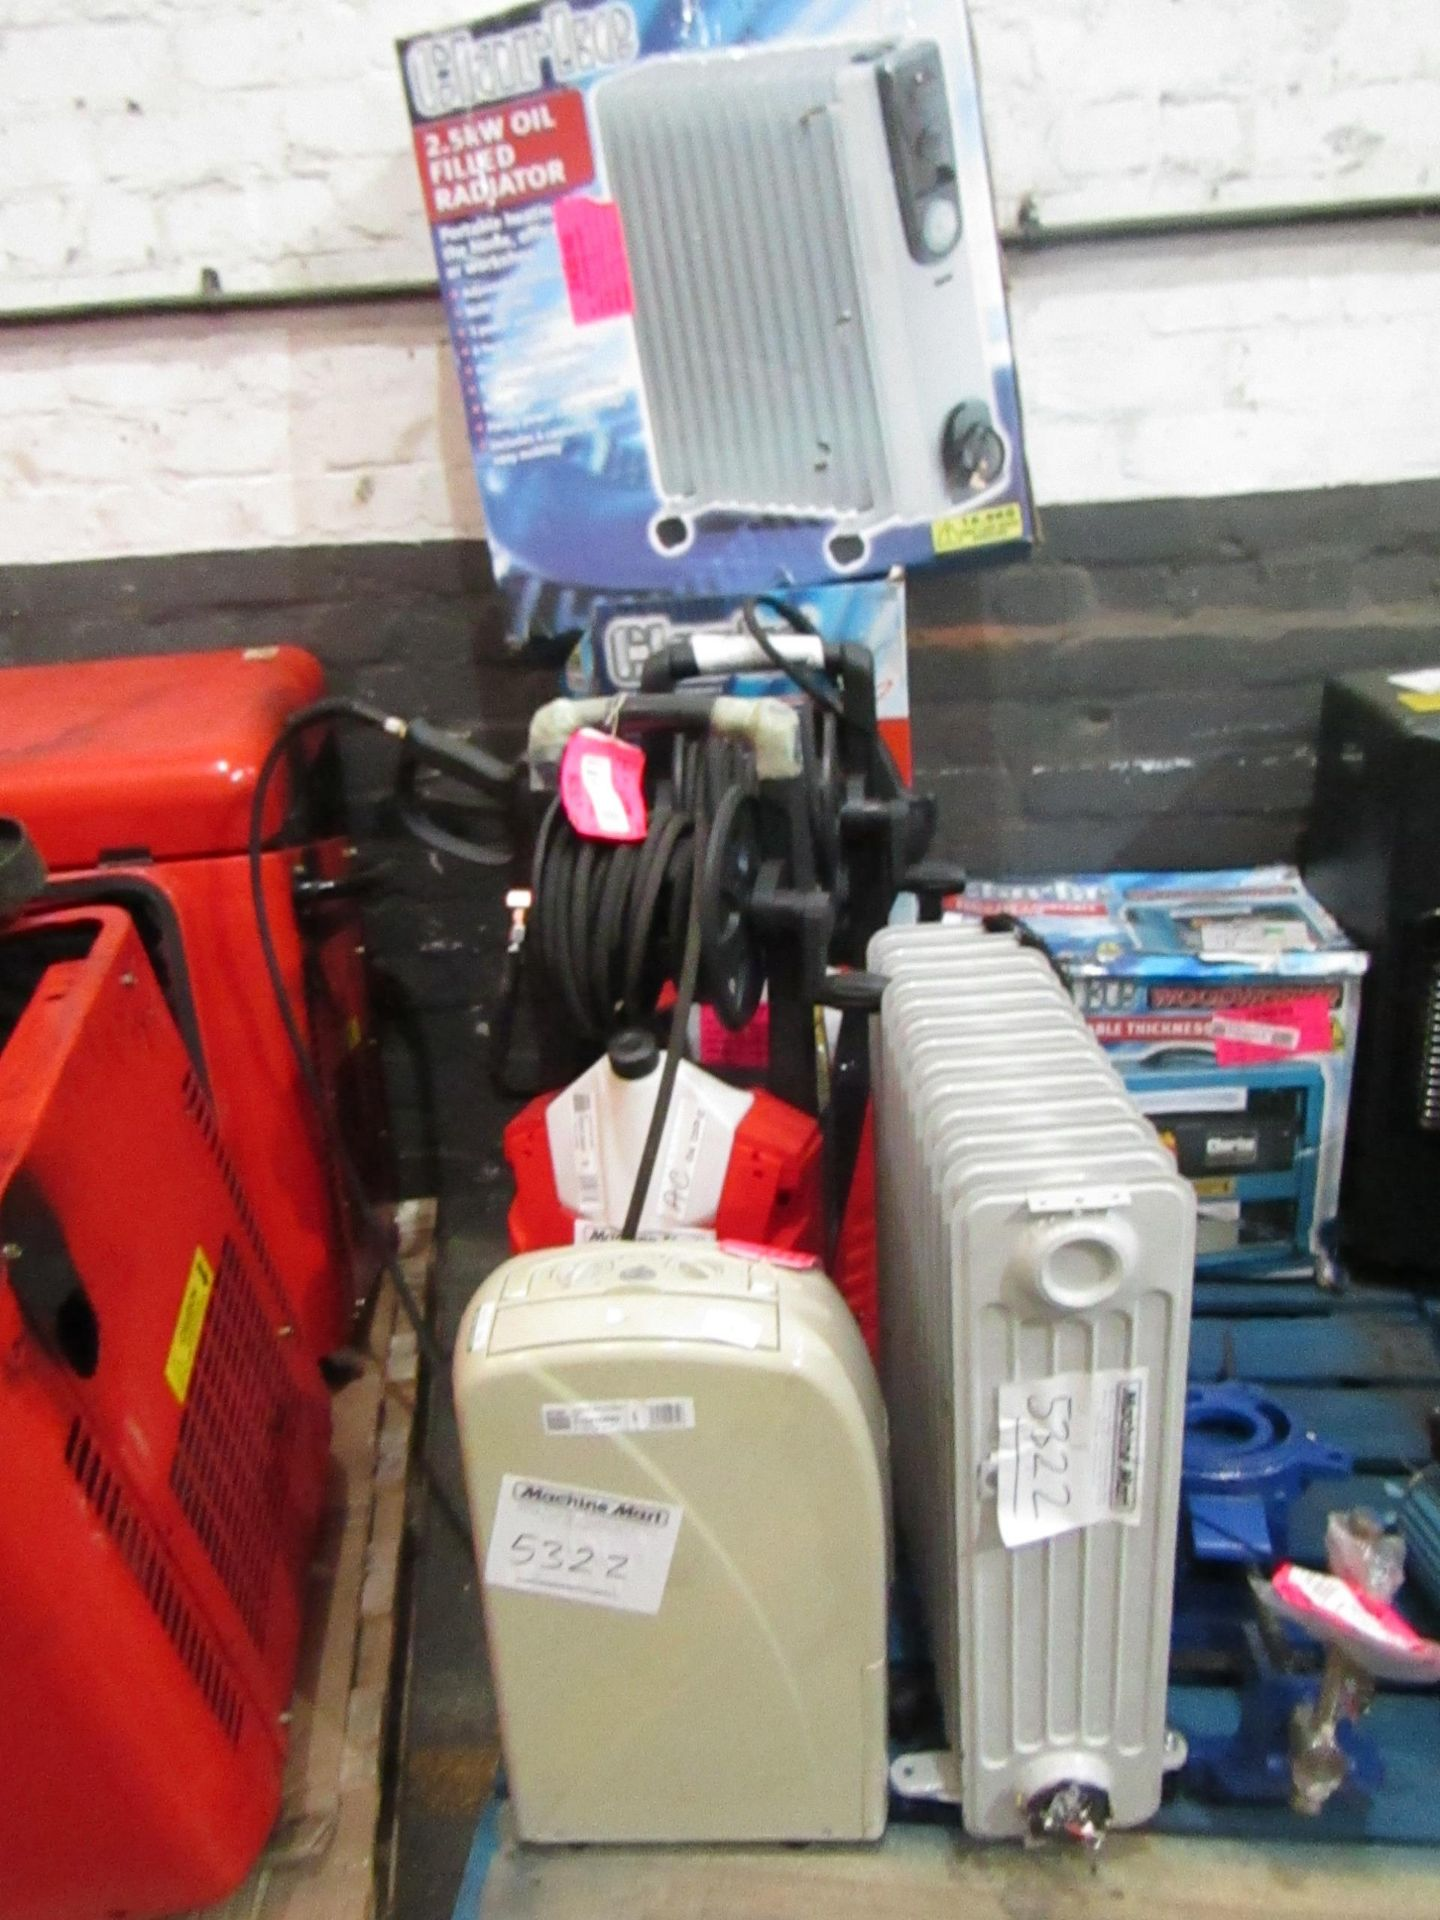 Lot 2 - 6x Items being; Clarke YDK10 10 Litre Dehumidifier - RRP £69.98 2x Clarke radiator - £56.99 3x